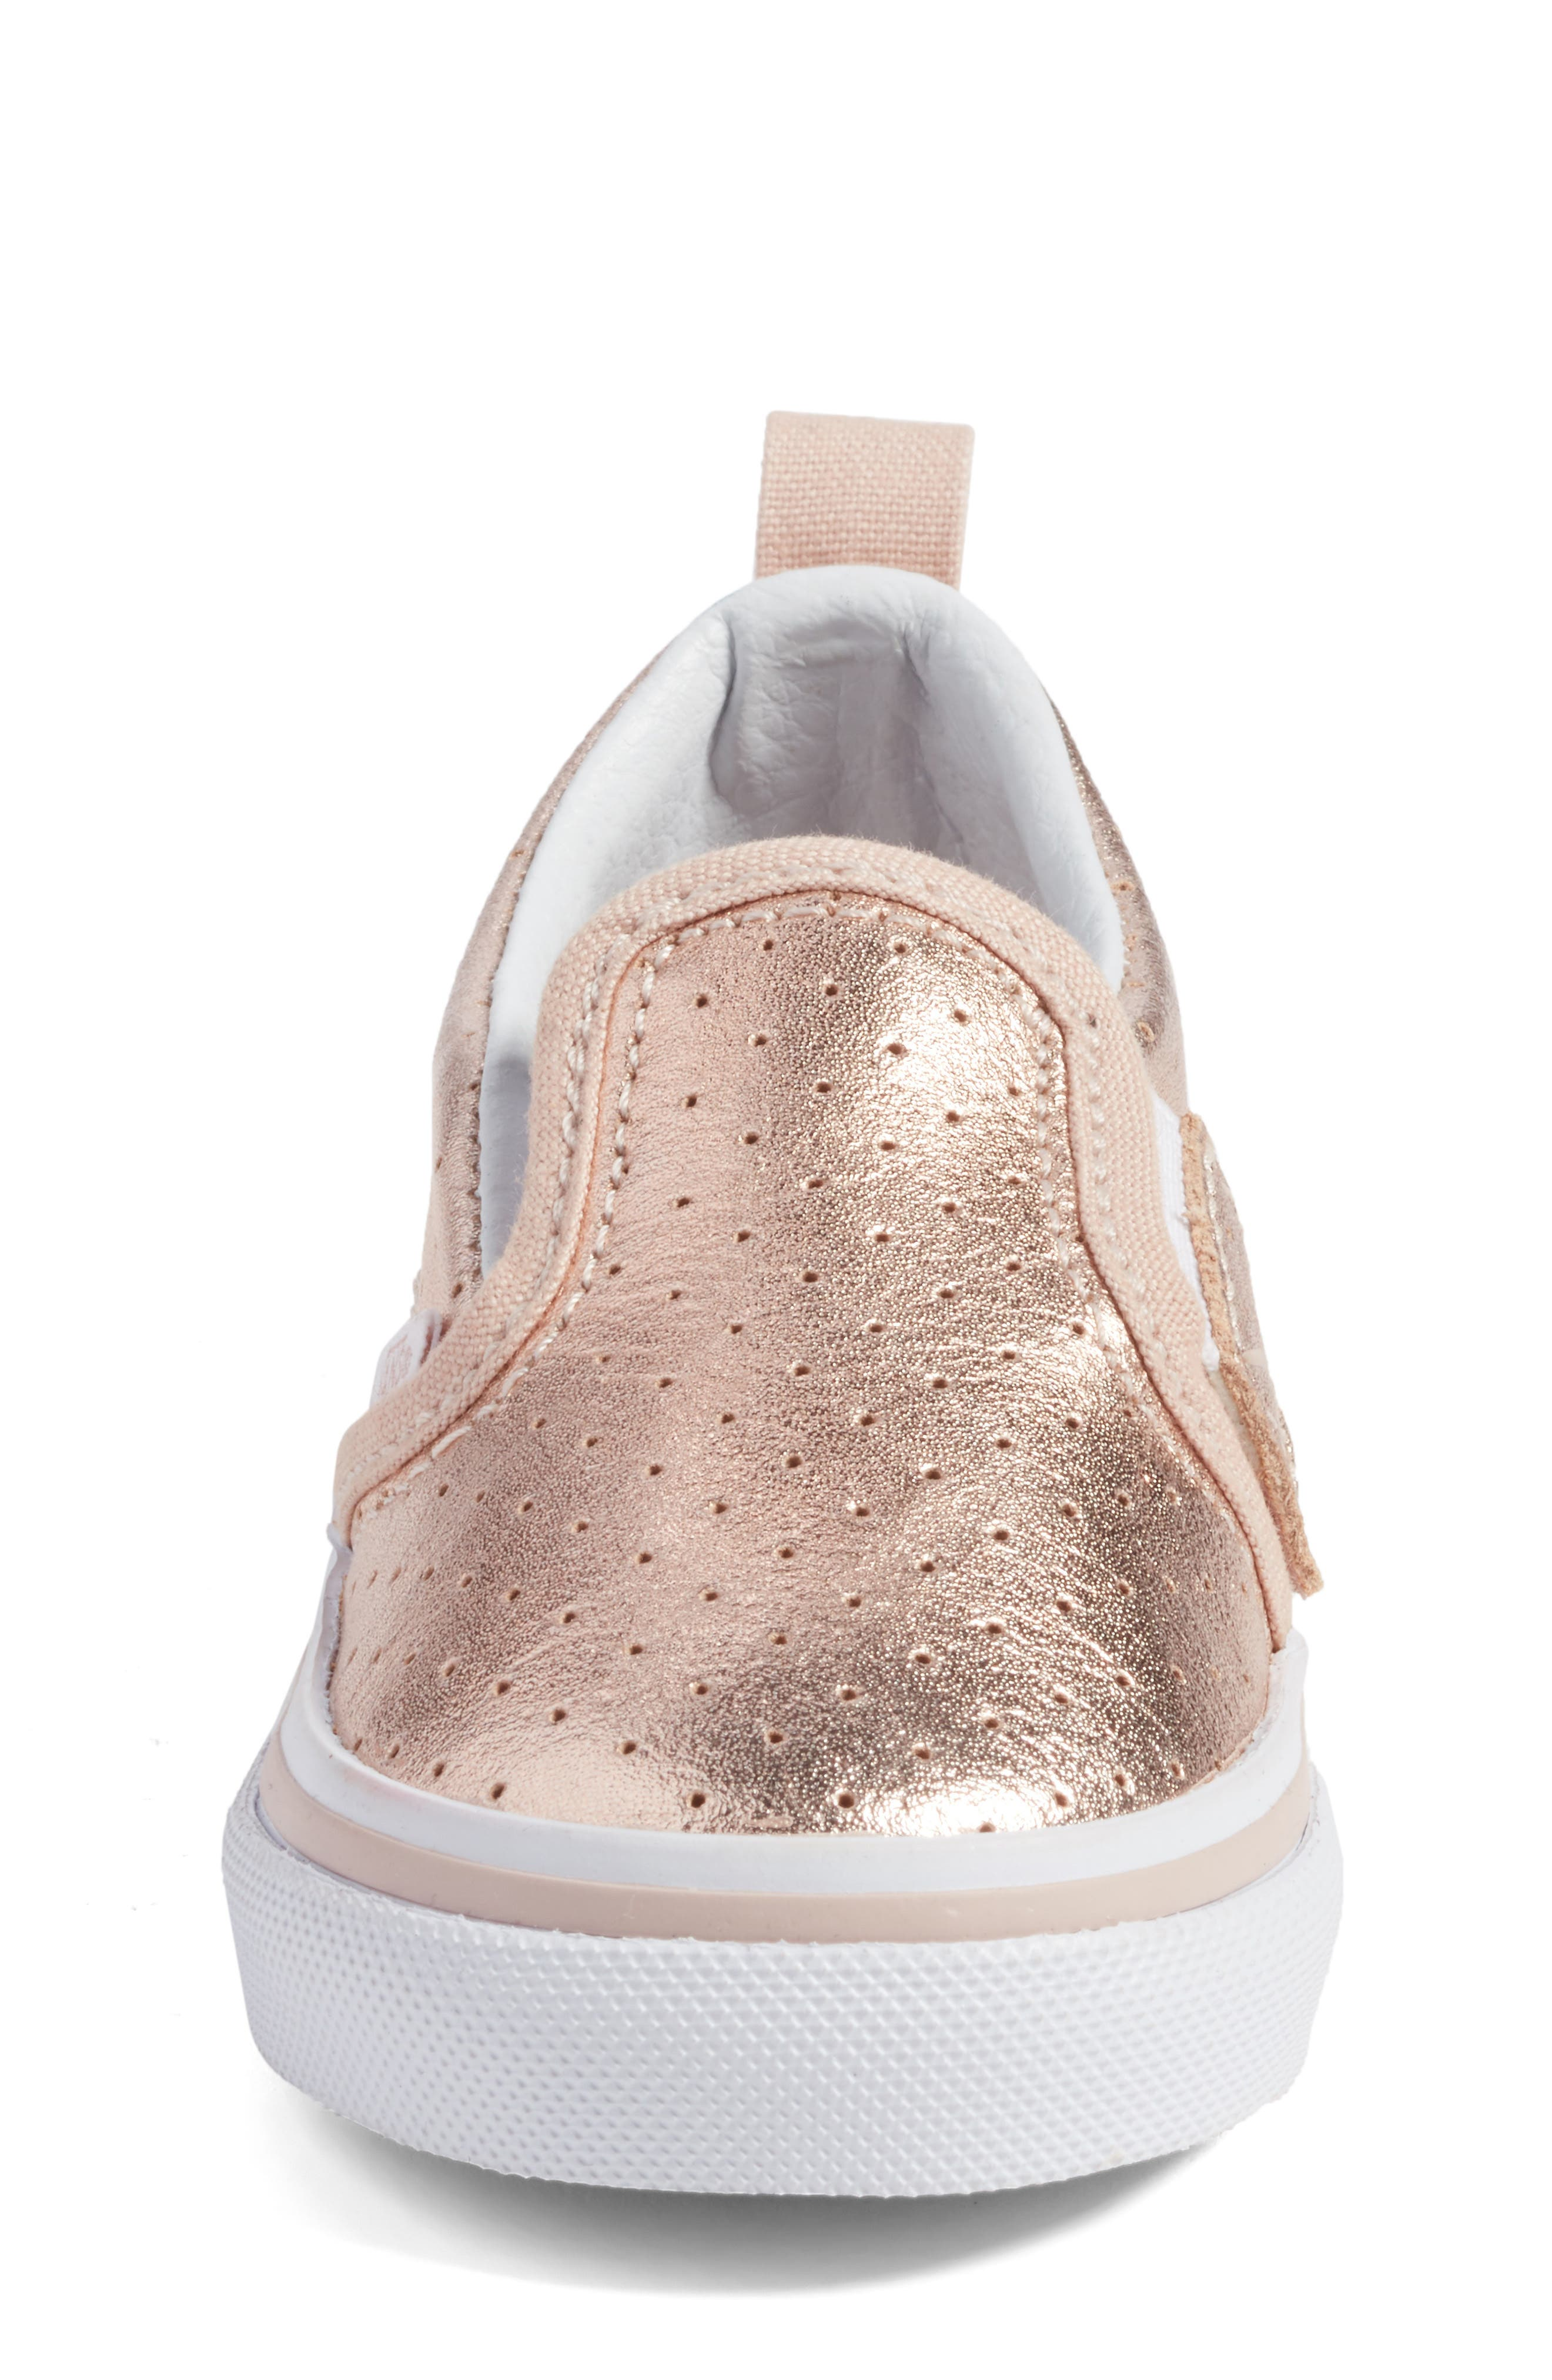 'Classic' Slip-On Sneaker,                             Alternate thumbnail 4, color,                             Rose Gold Perf Leather